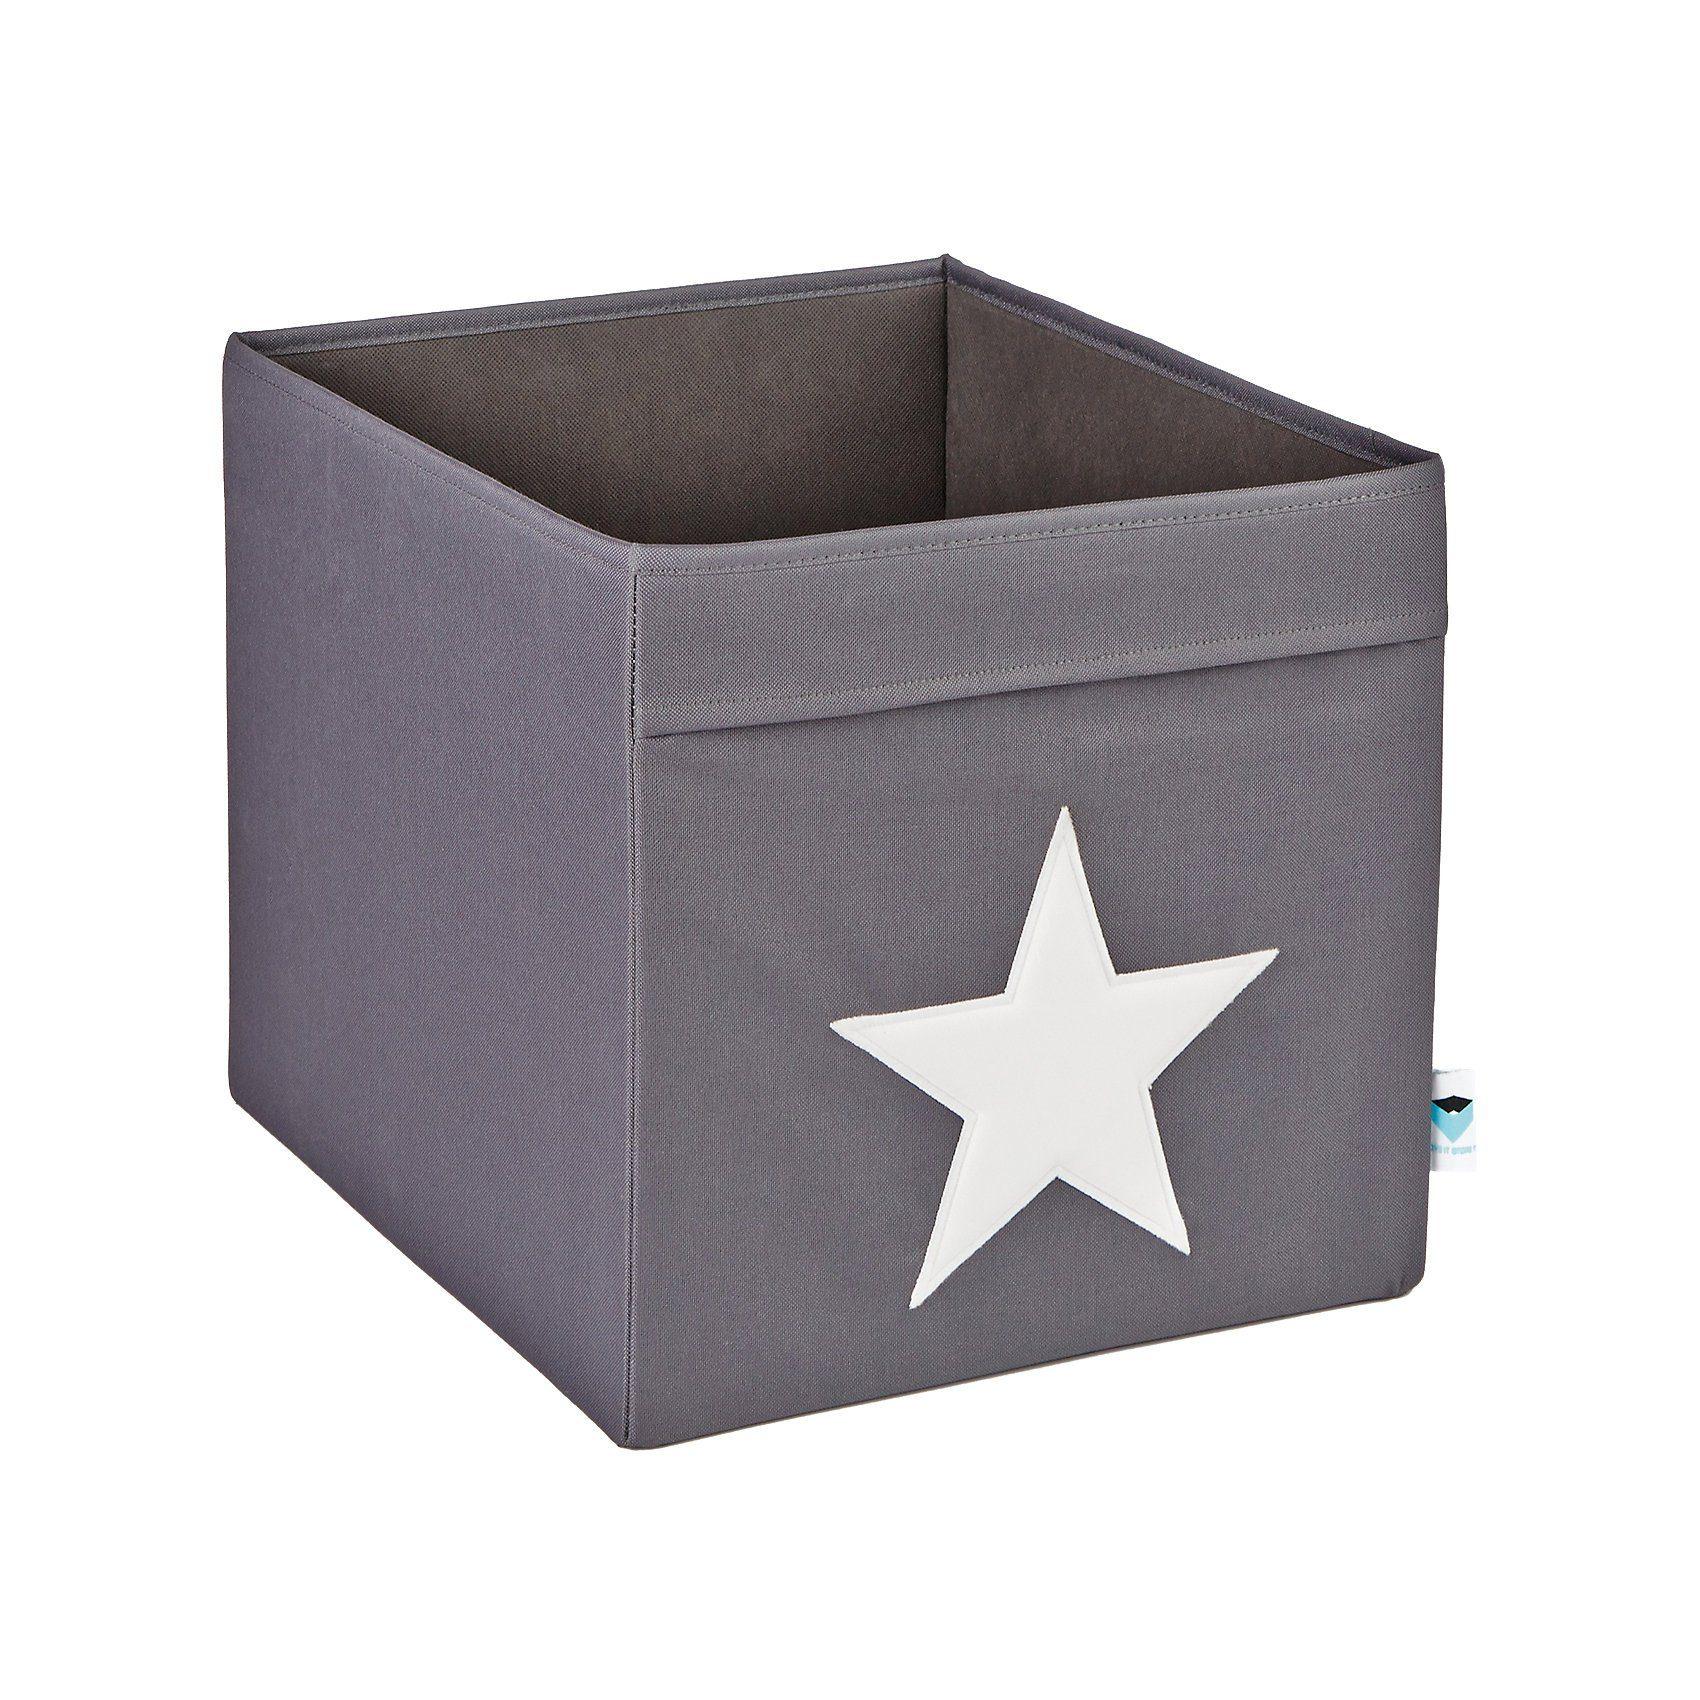 Faltbox Stern, groß, grau